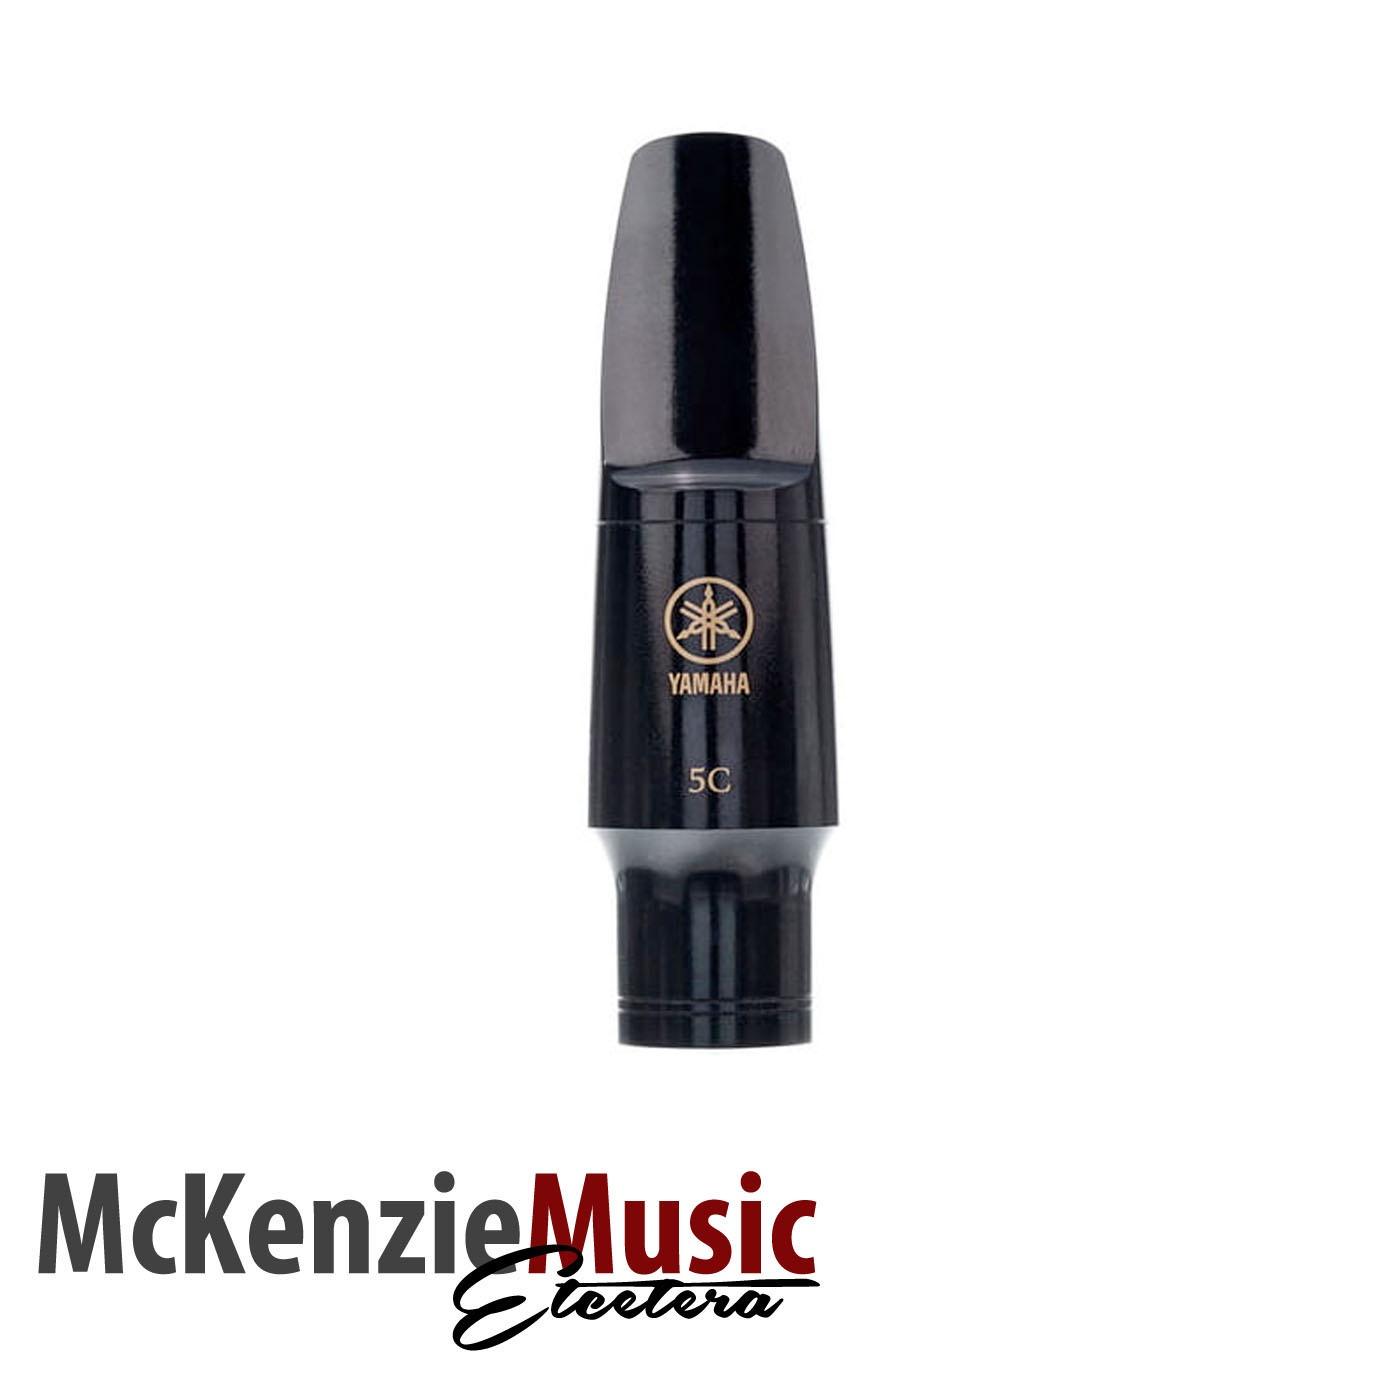 Yamaha Tenor Saxophone Mouthpiece 5C